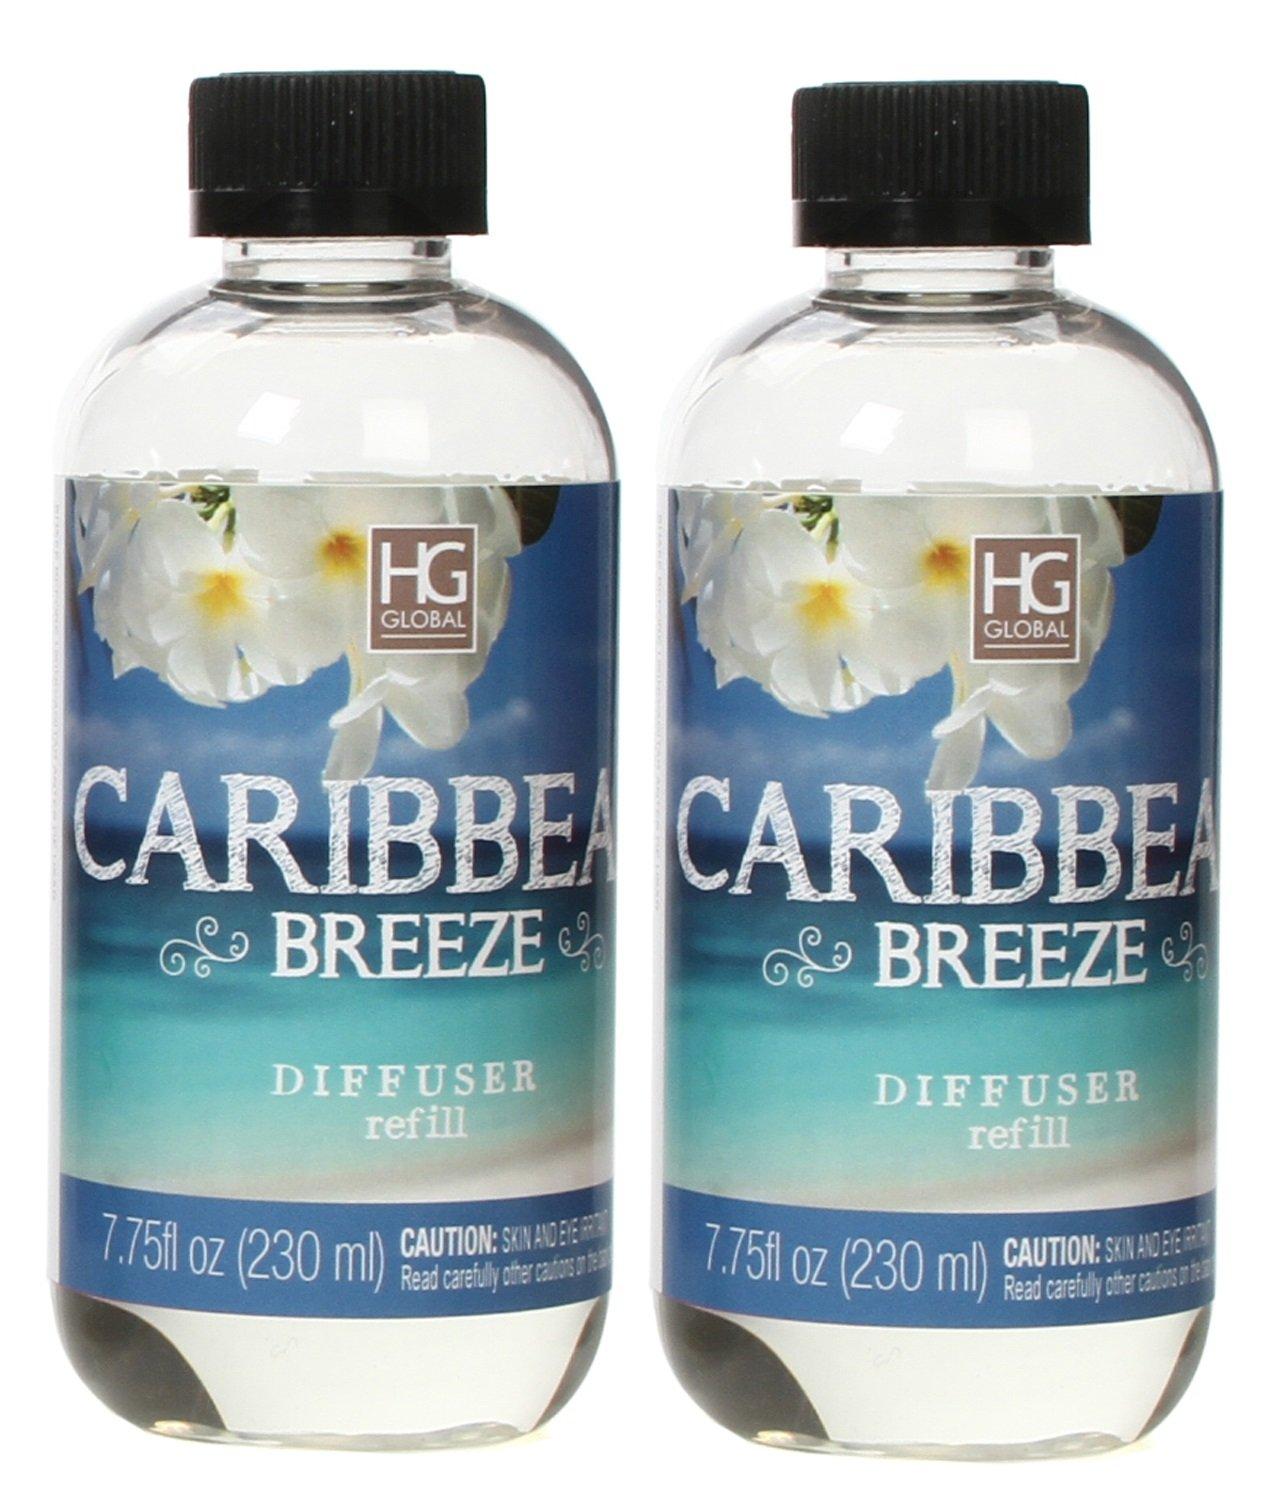 Hosley Set of 2 Premium Caribbean Breeze Reed Diffuser Refills Oil, 230 ml (7.75 fl oz) Made in USA. Bulk Buy. Ideal Gift for Weddings, spa, Reiki, Meditation Settings W1